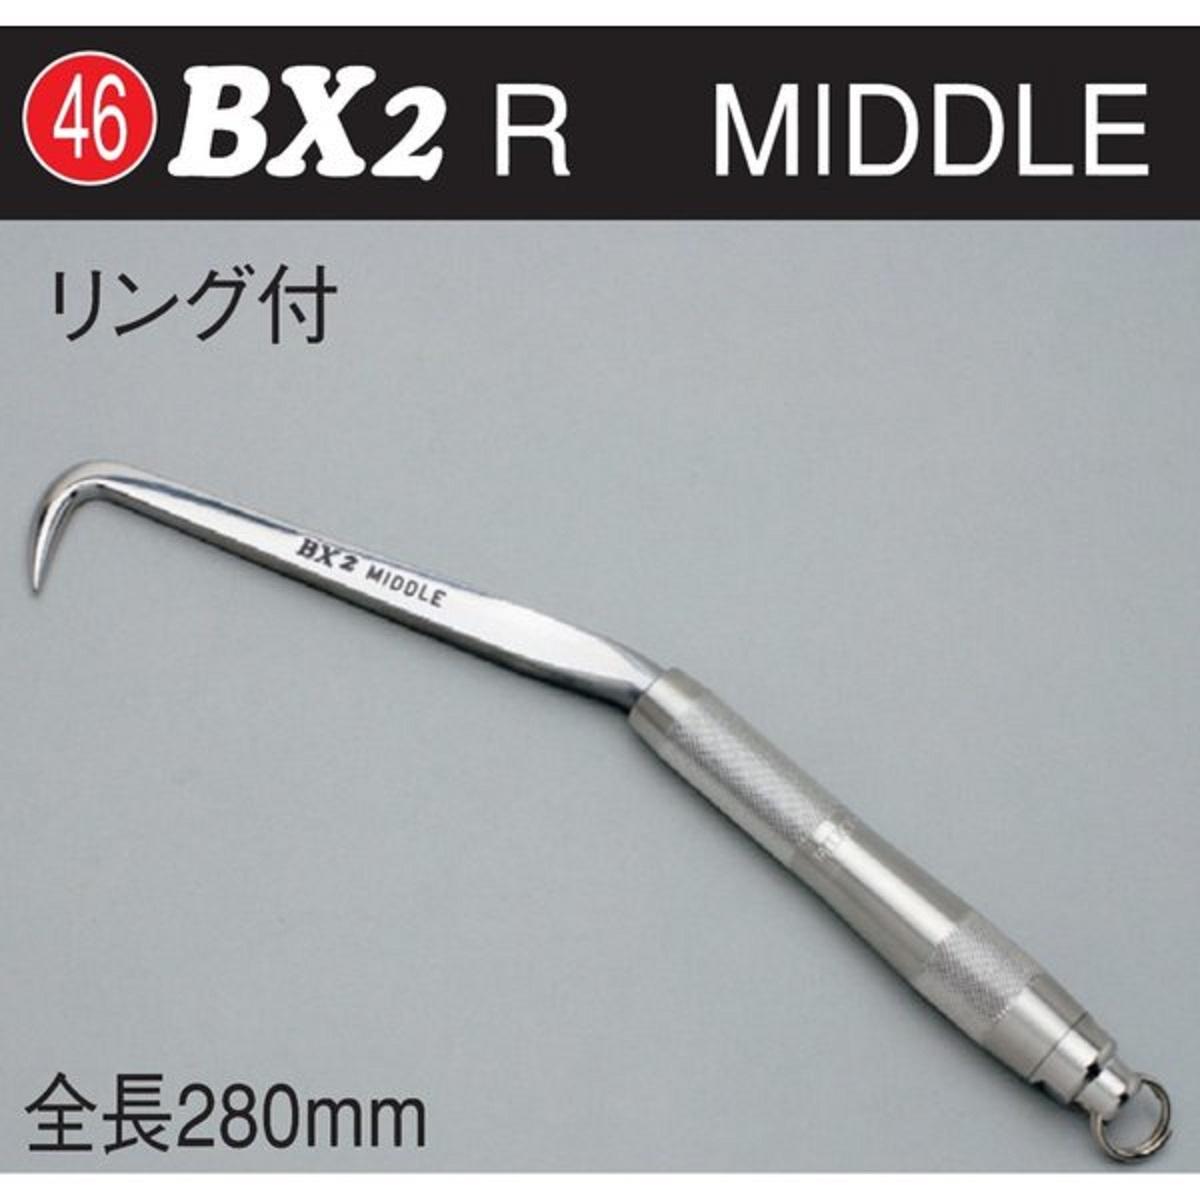 MIKI BX 2 R ハッカー ミドル リング付き  鉄筋用作業工具 結束線 ブランド ミキ 三貴